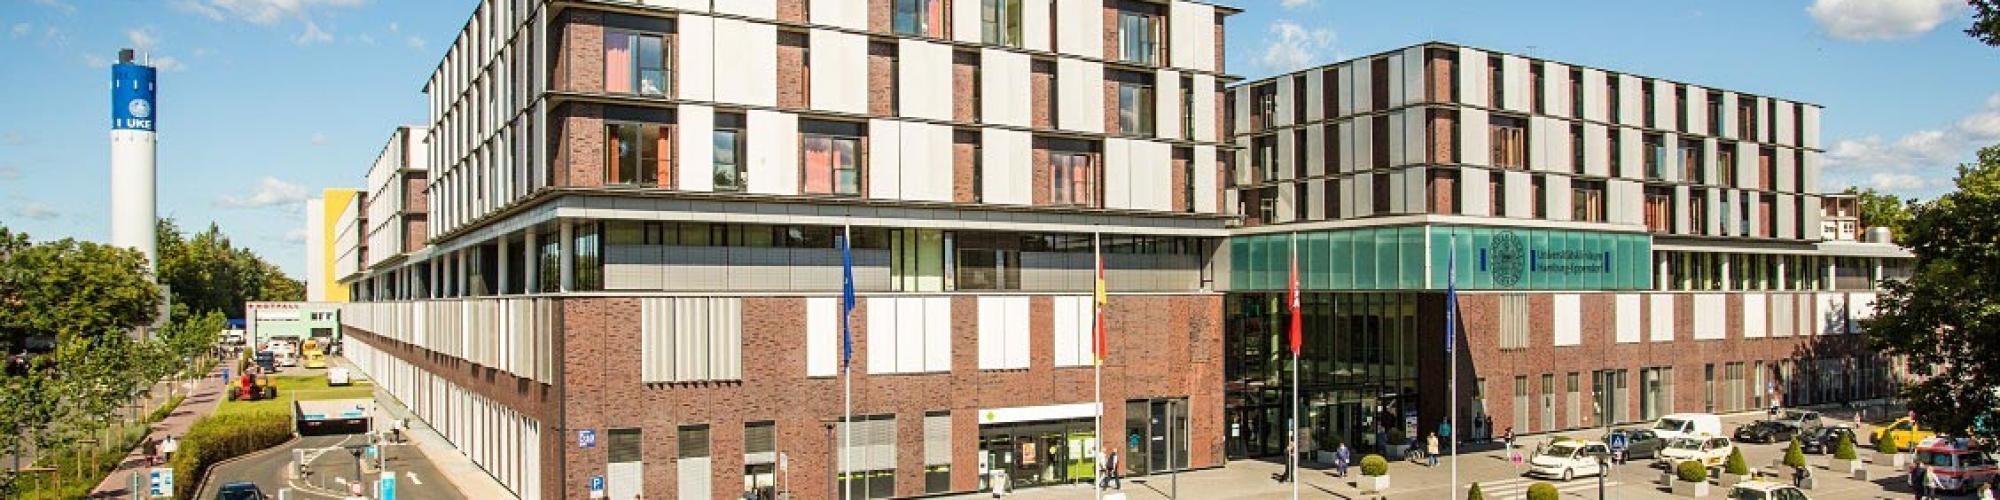 Universitätsklinikum Hamburg-Eppendorf (UKE)